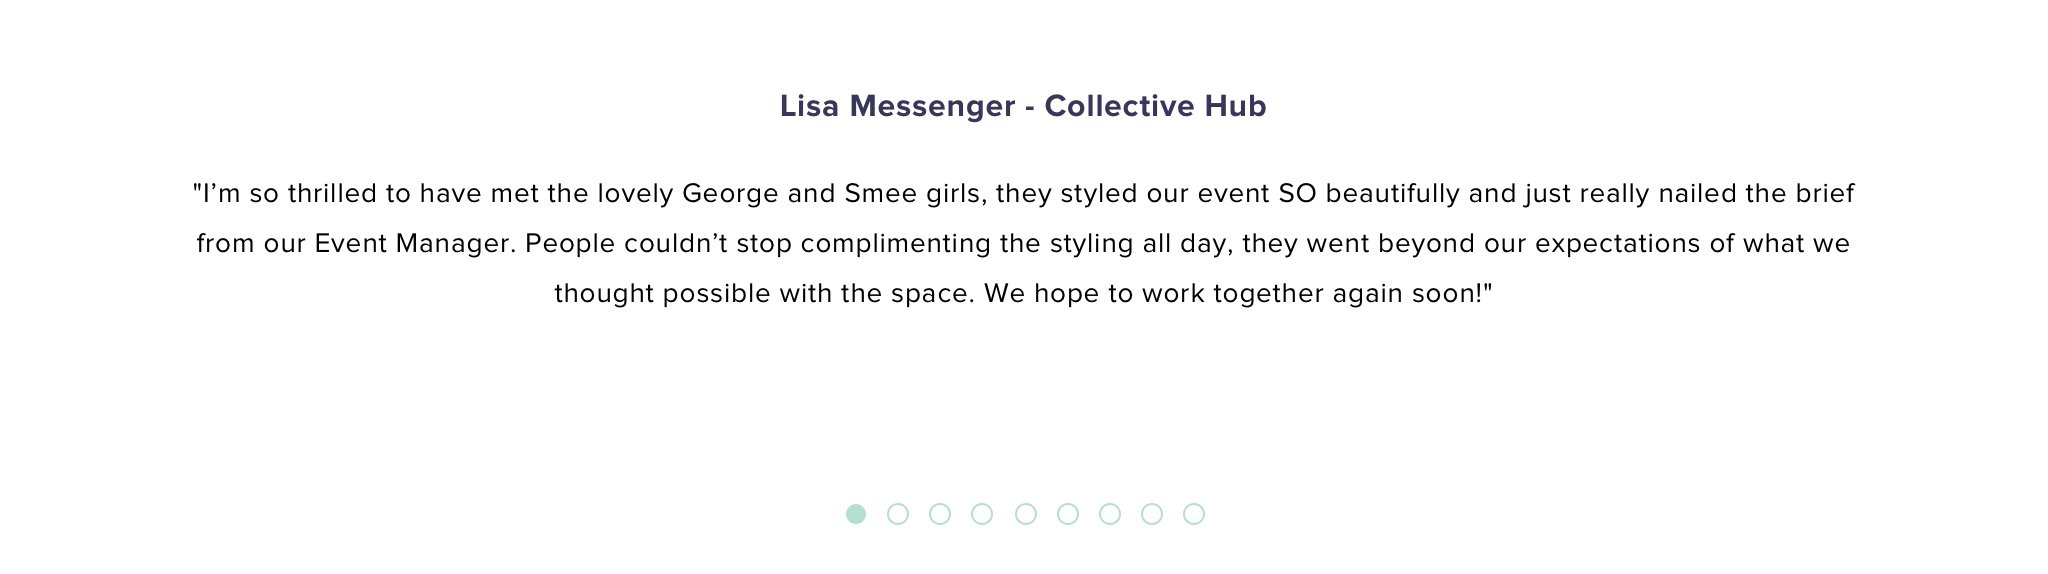 01-Lisa-Messenger.png